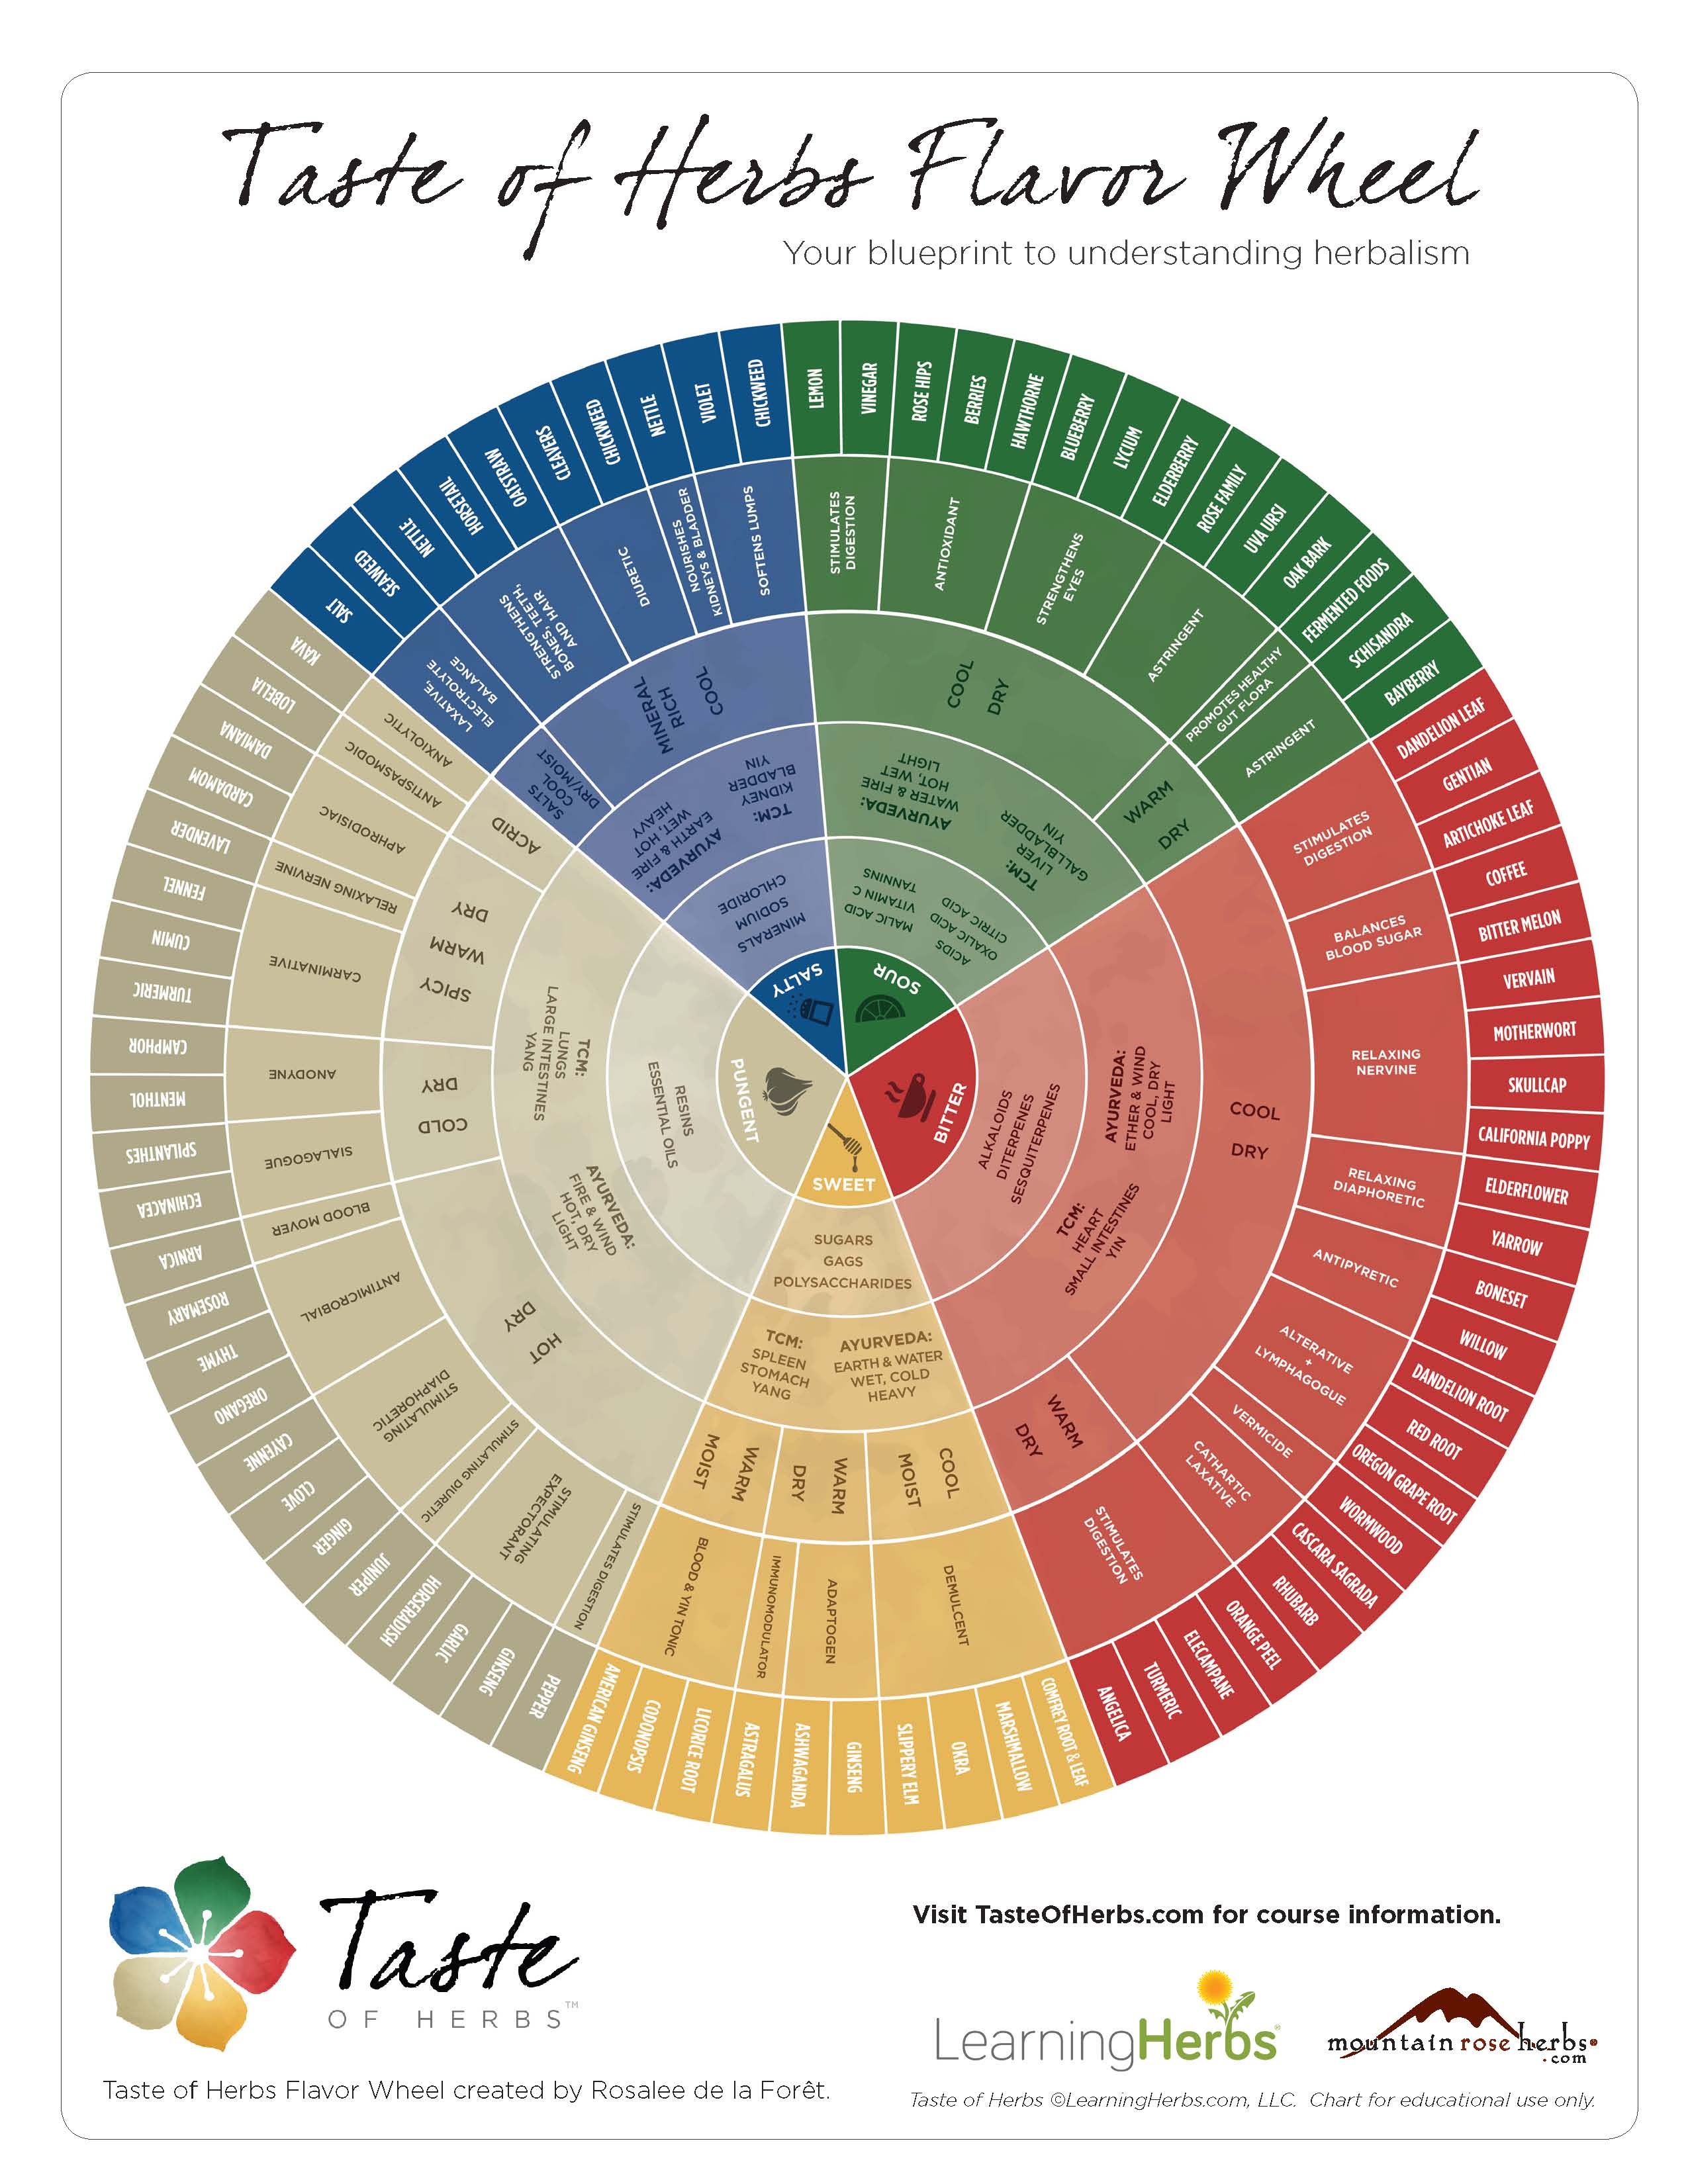 Taste of Herbs Flavor Wheel, by Rosalee de la Foraªt, reprinted with permission.